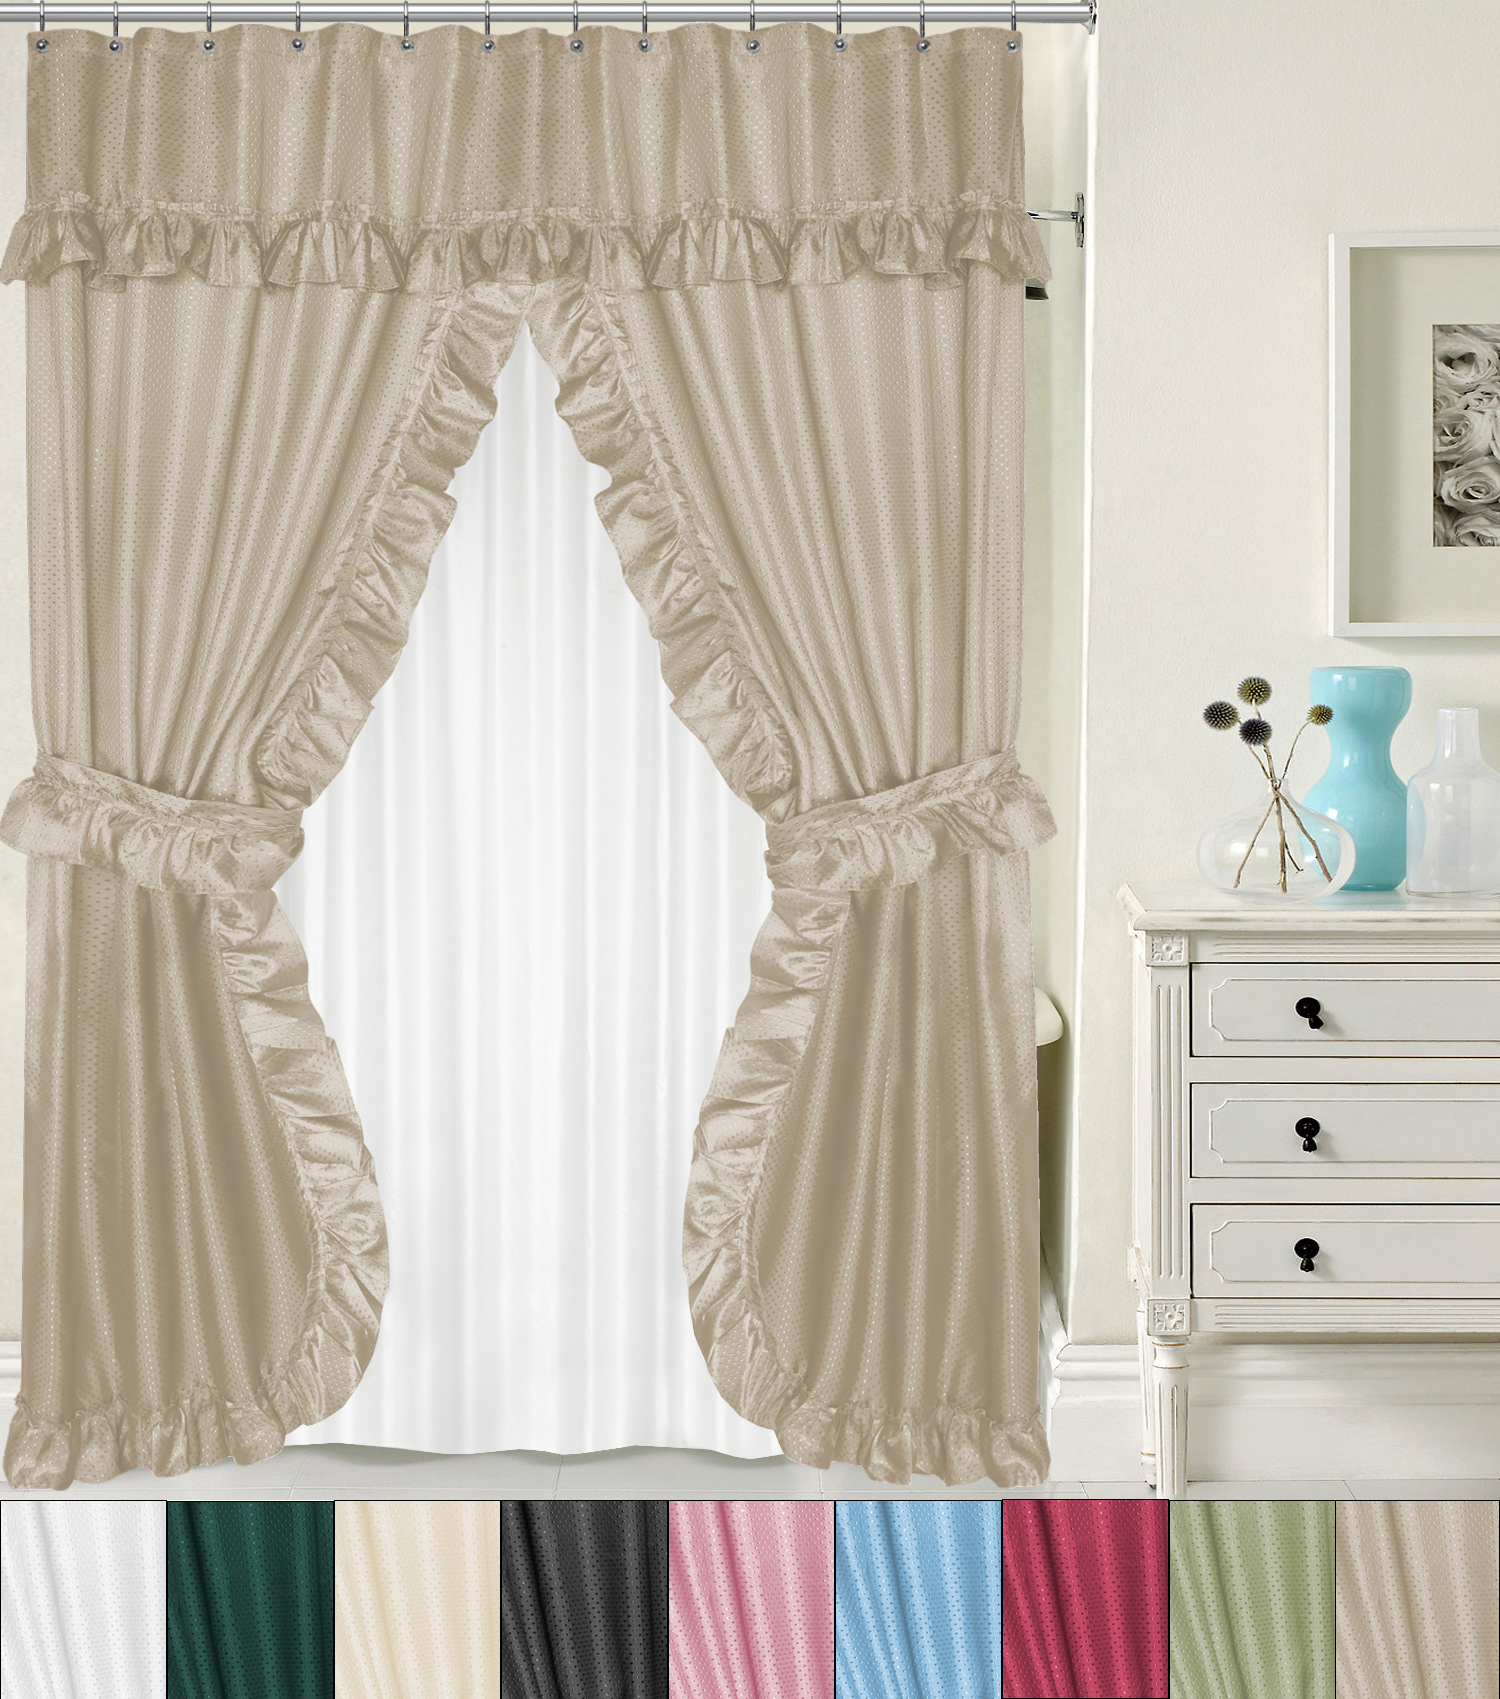 Details About Lauren Double Swag Peva Fabric Shower Curtain W Tie Backs Liner 70 X 72